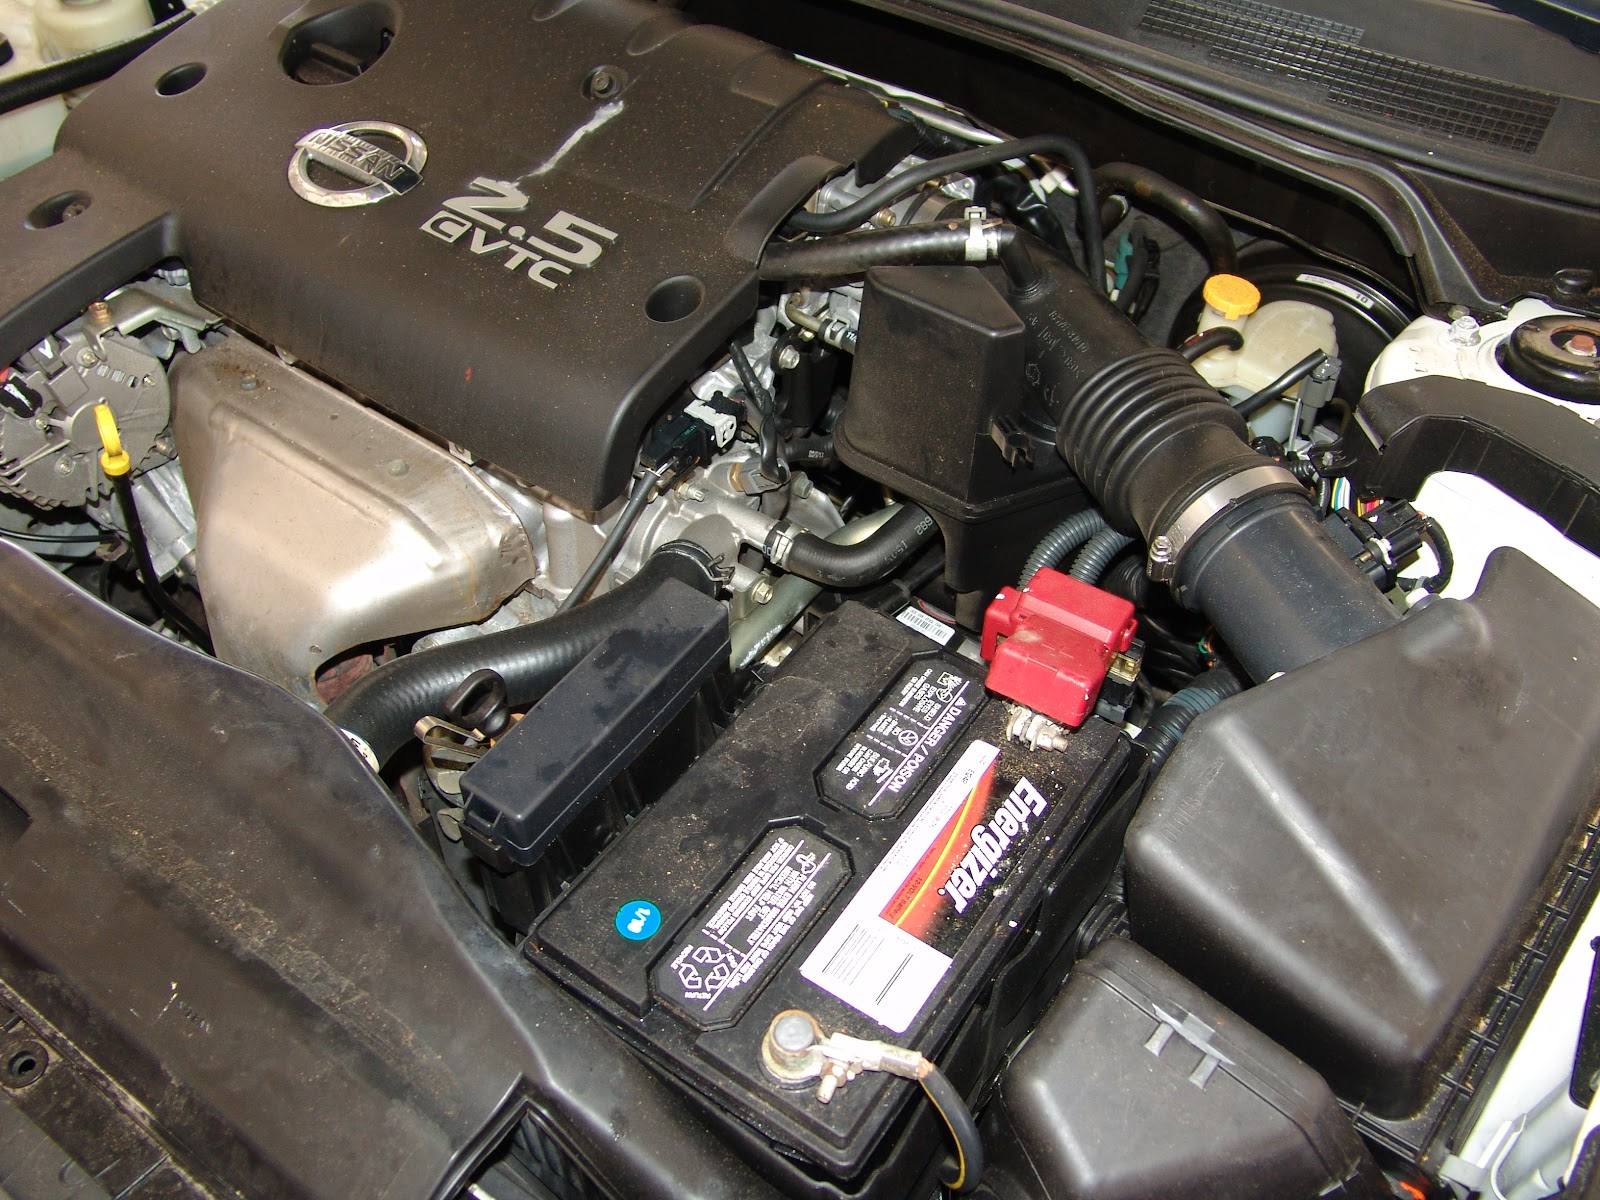 Nissan Xterra Oxygen Sensor Location likewise 2006 Scion Tc Fuse Box Diagram together with Dodge O2 Sensor Wiring Diagram as well Nissan Sentra 2004 2 5 Fuel Filter Location likewise megasquirtuk co. on toyota o2 sensor location 2004